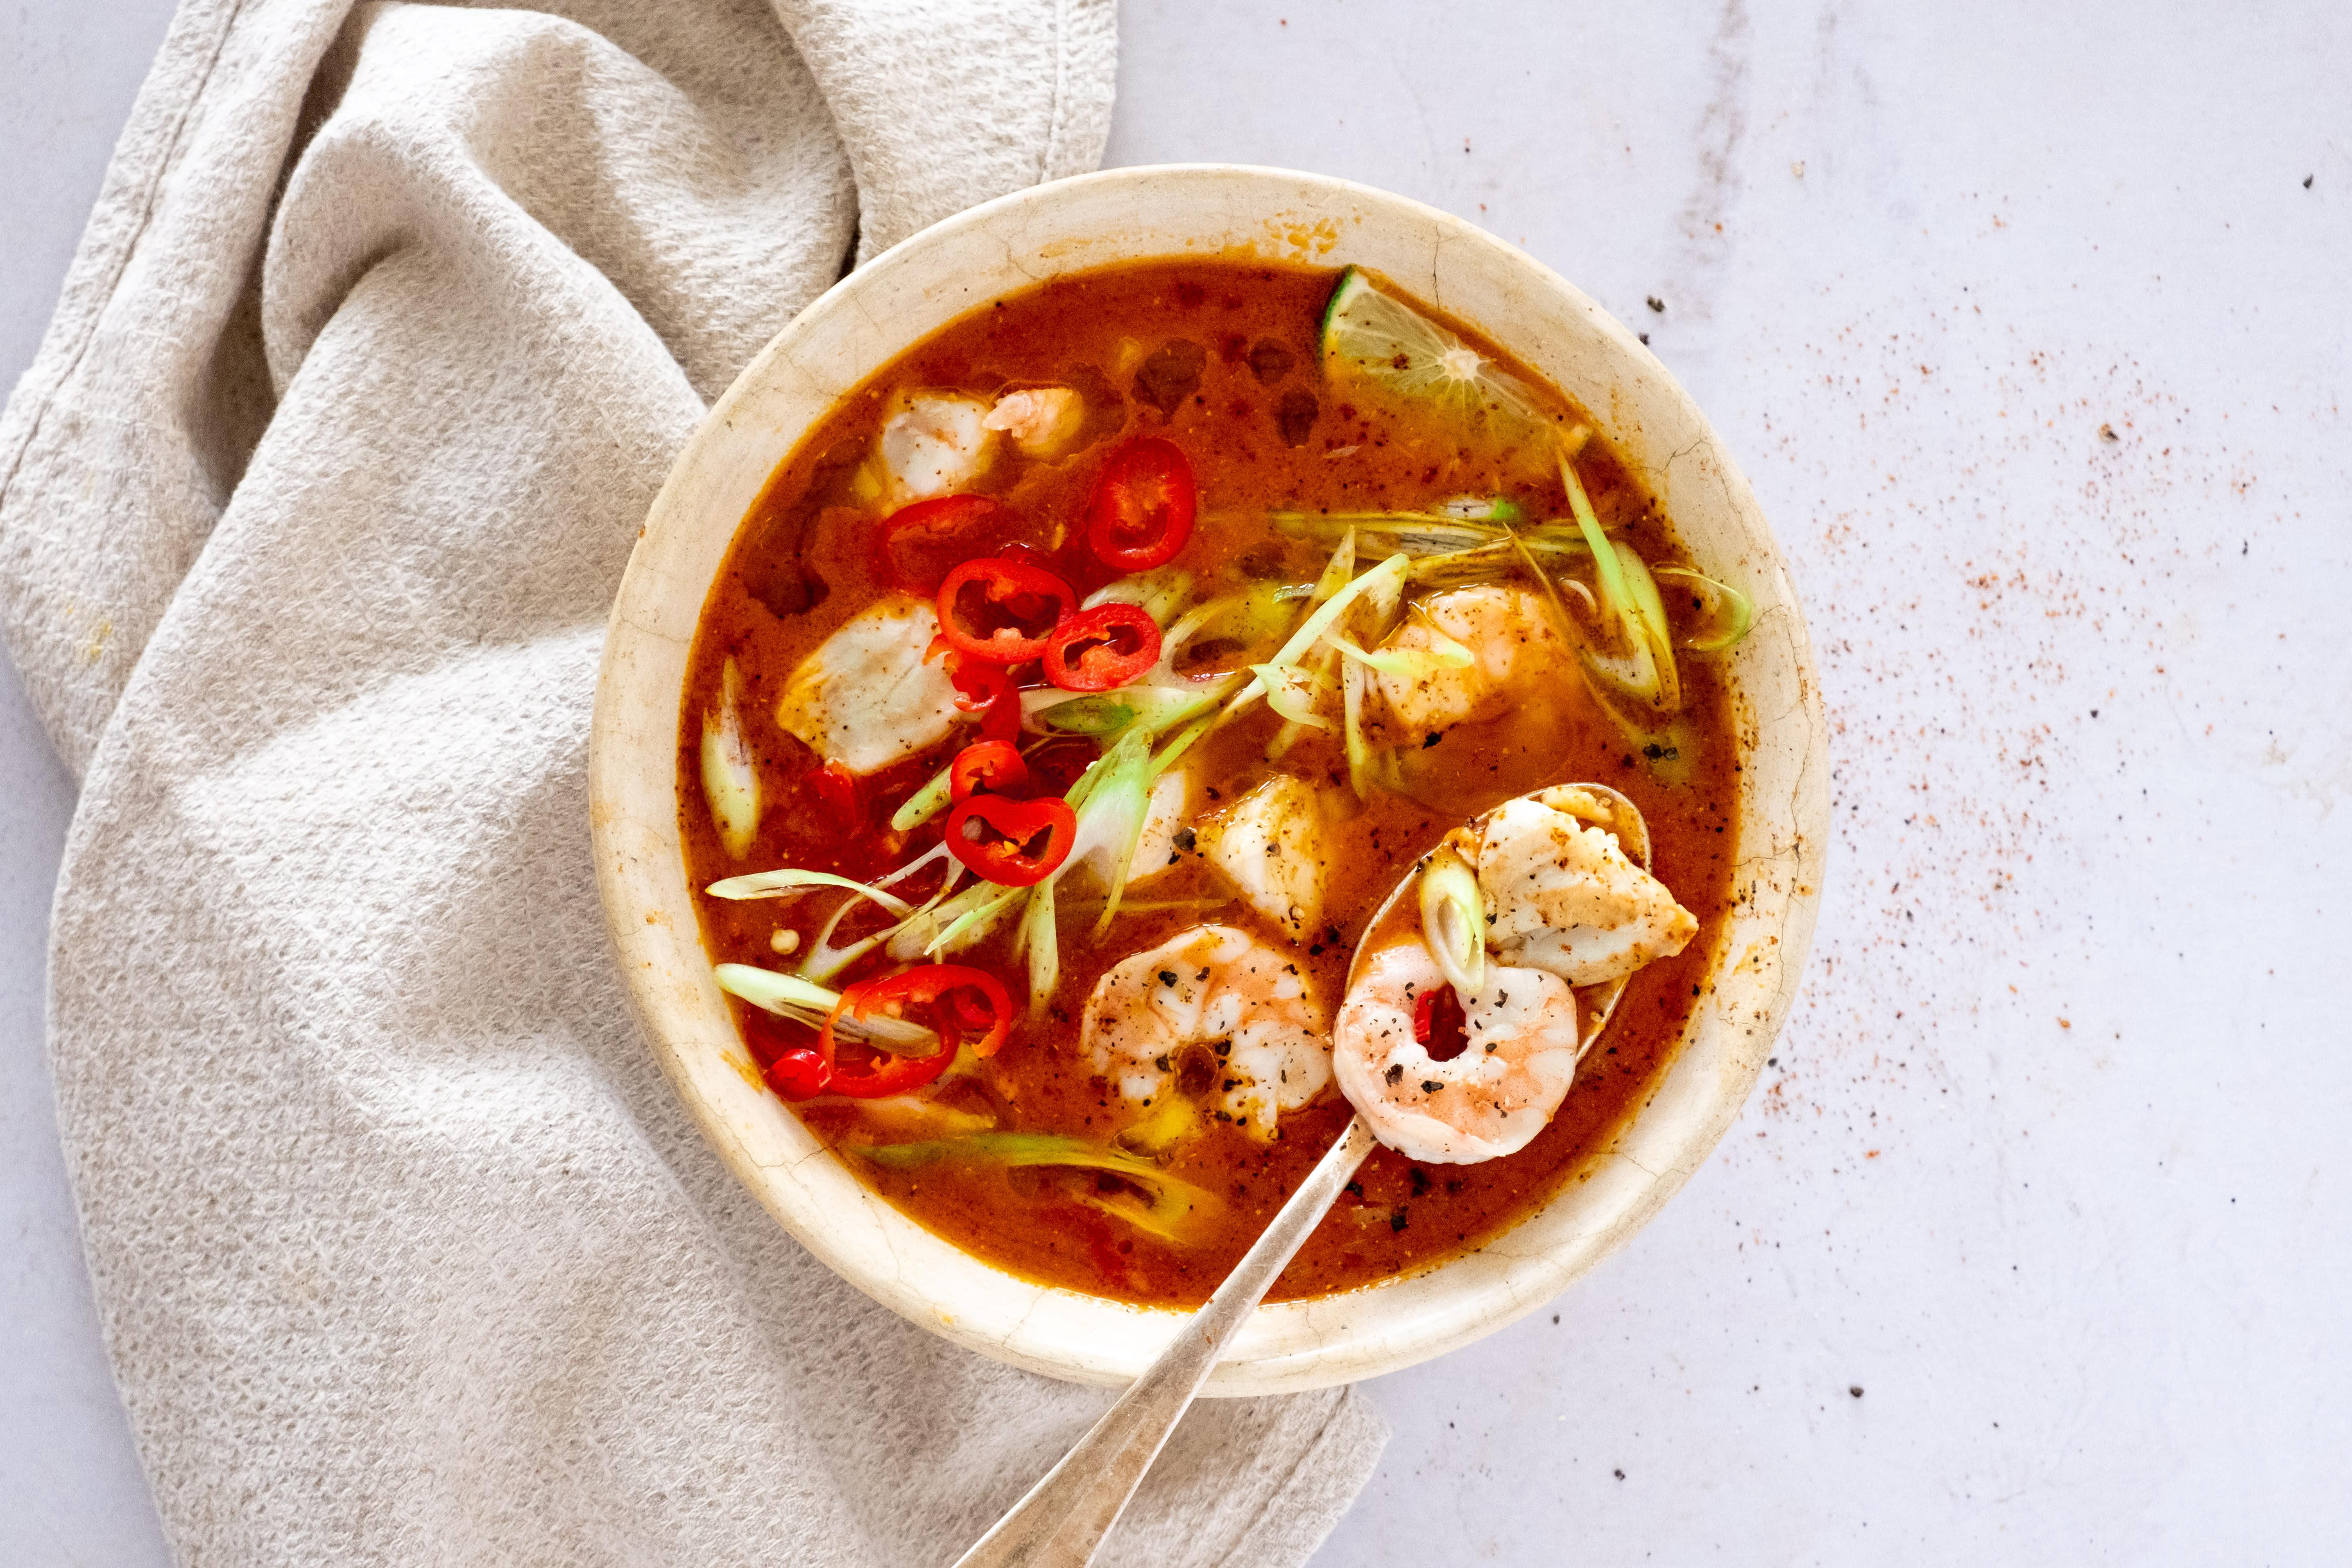 Brazilian Moqueca Soup with Cod and Prawns